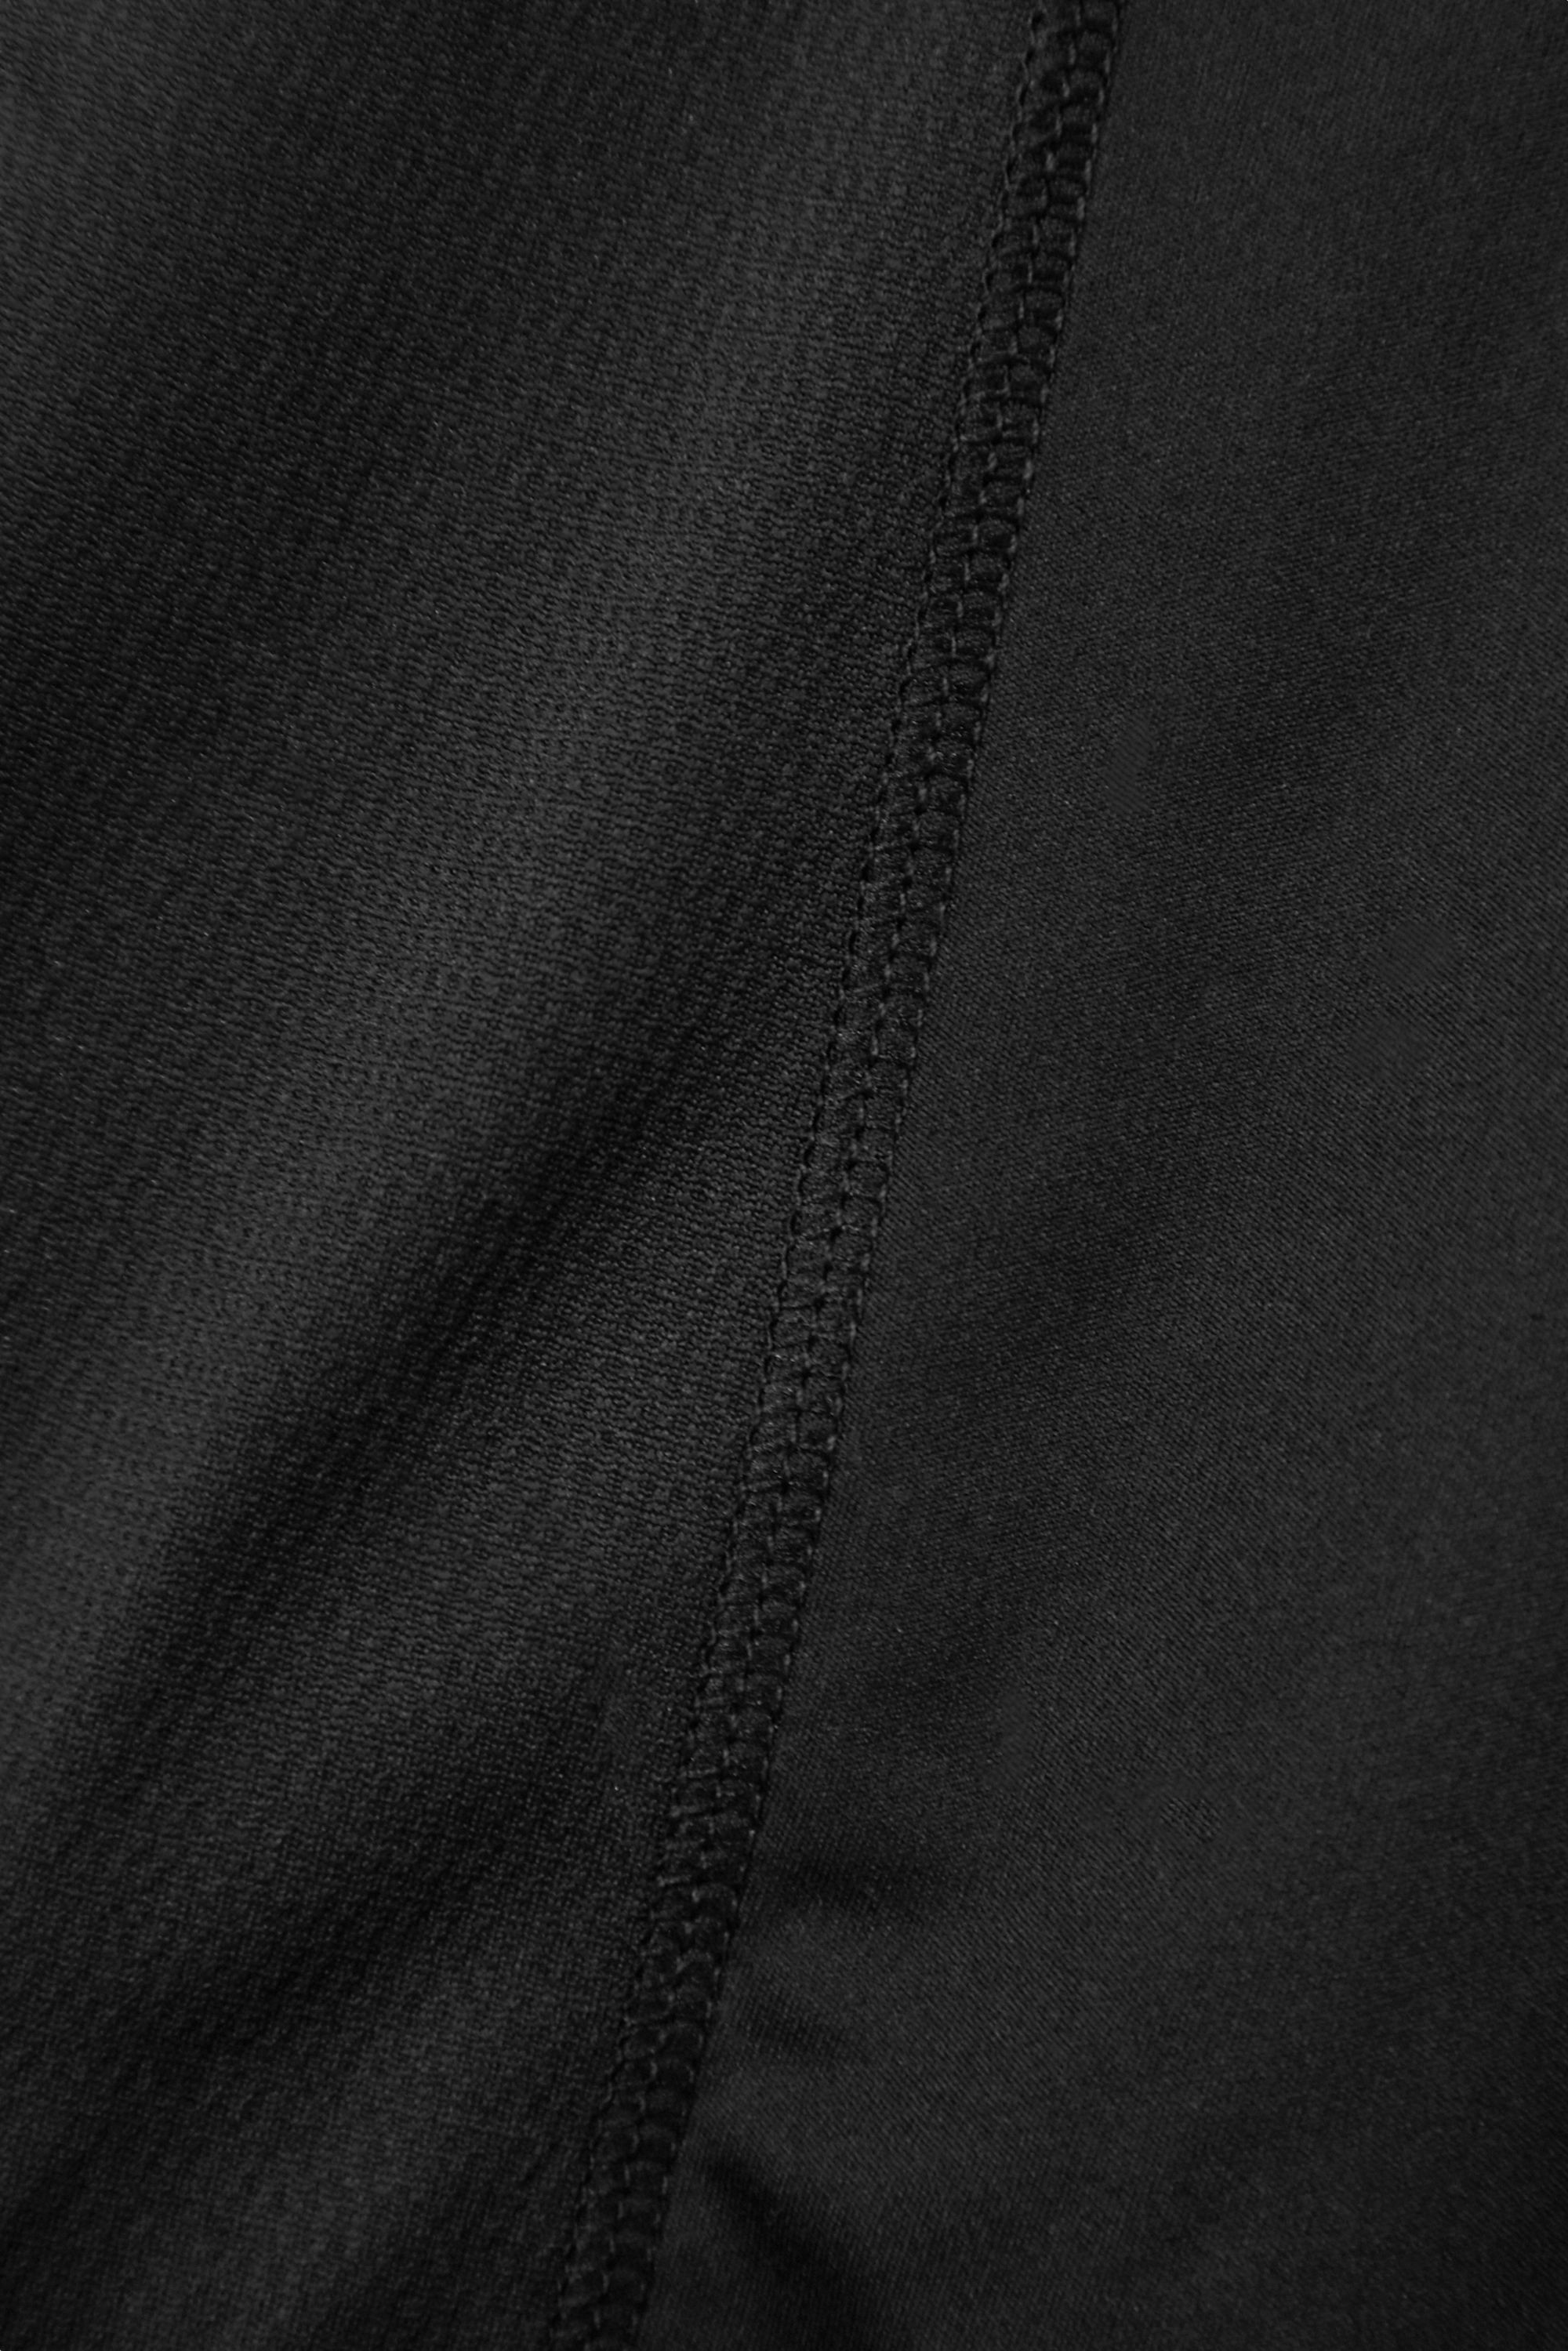 Nike City Sleek printed Dri-FIT tank